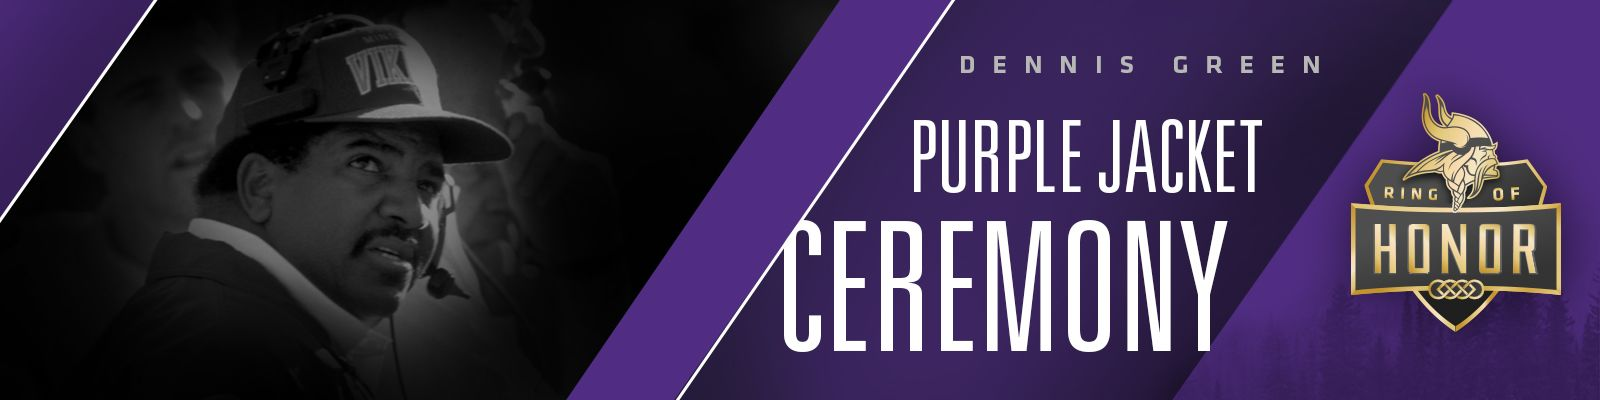 Purple-Jacket-Ceremony_1600x400